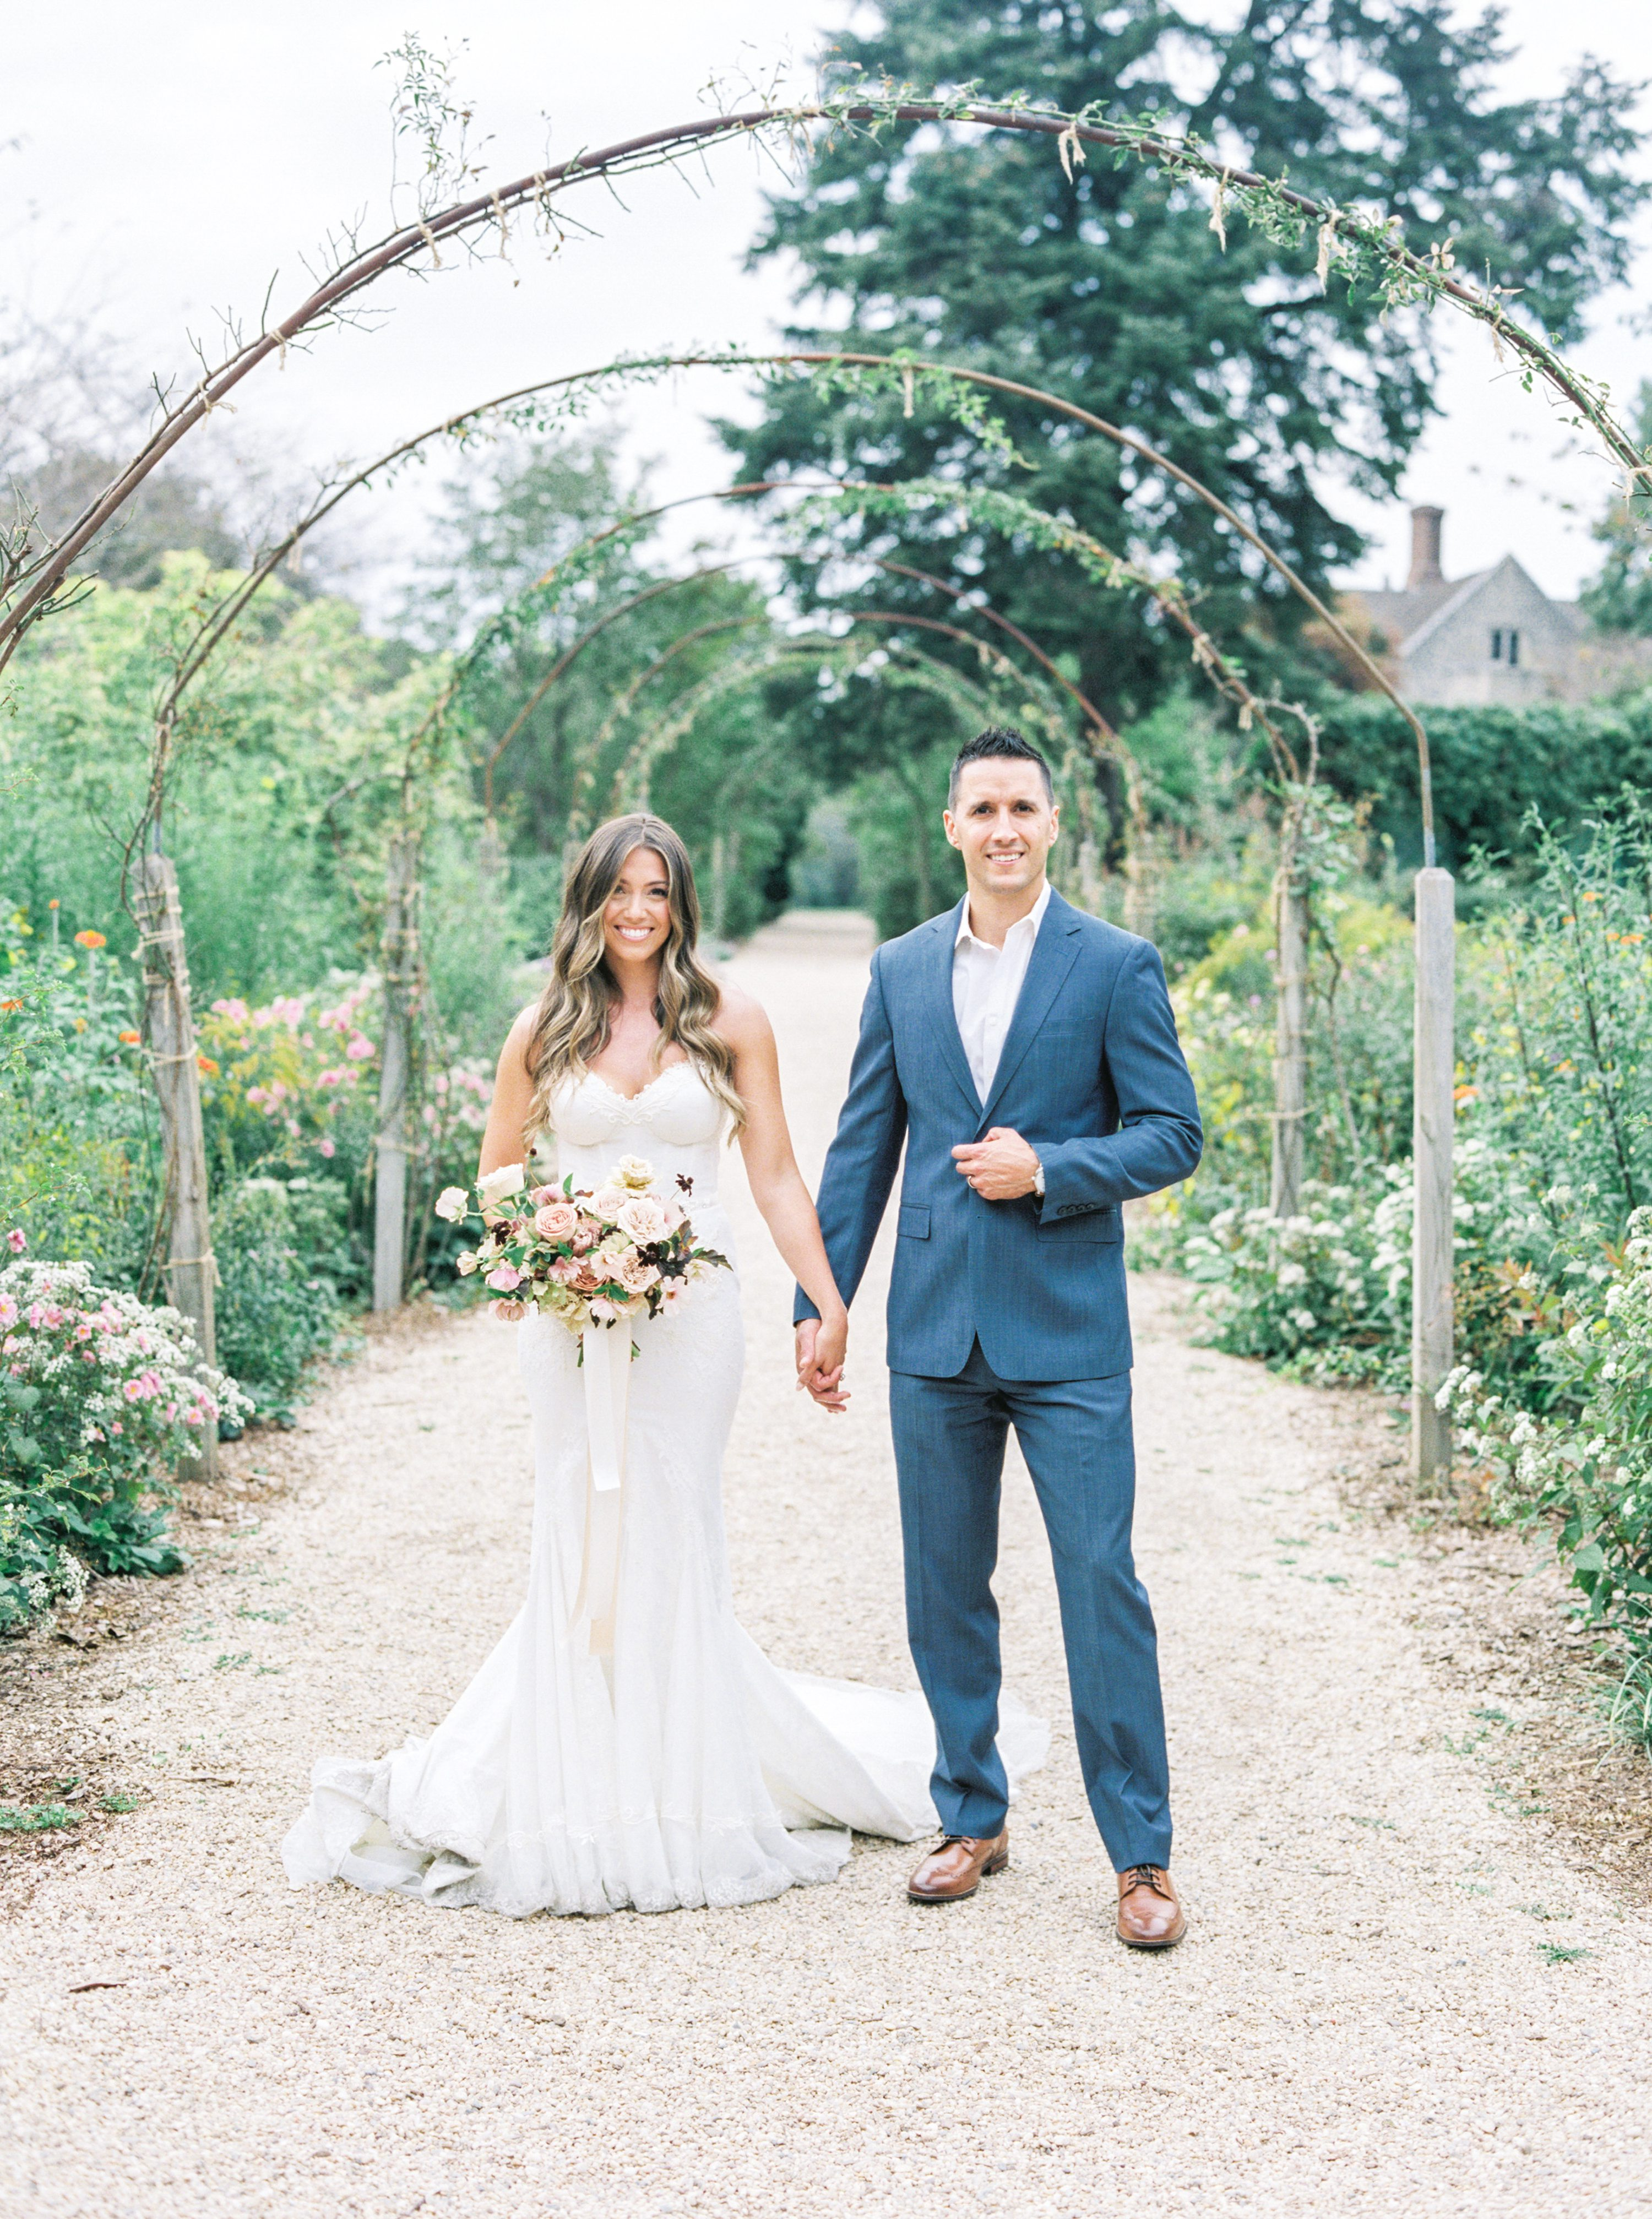 Hamptons Wedding Photographer,Jessa Schifilliti